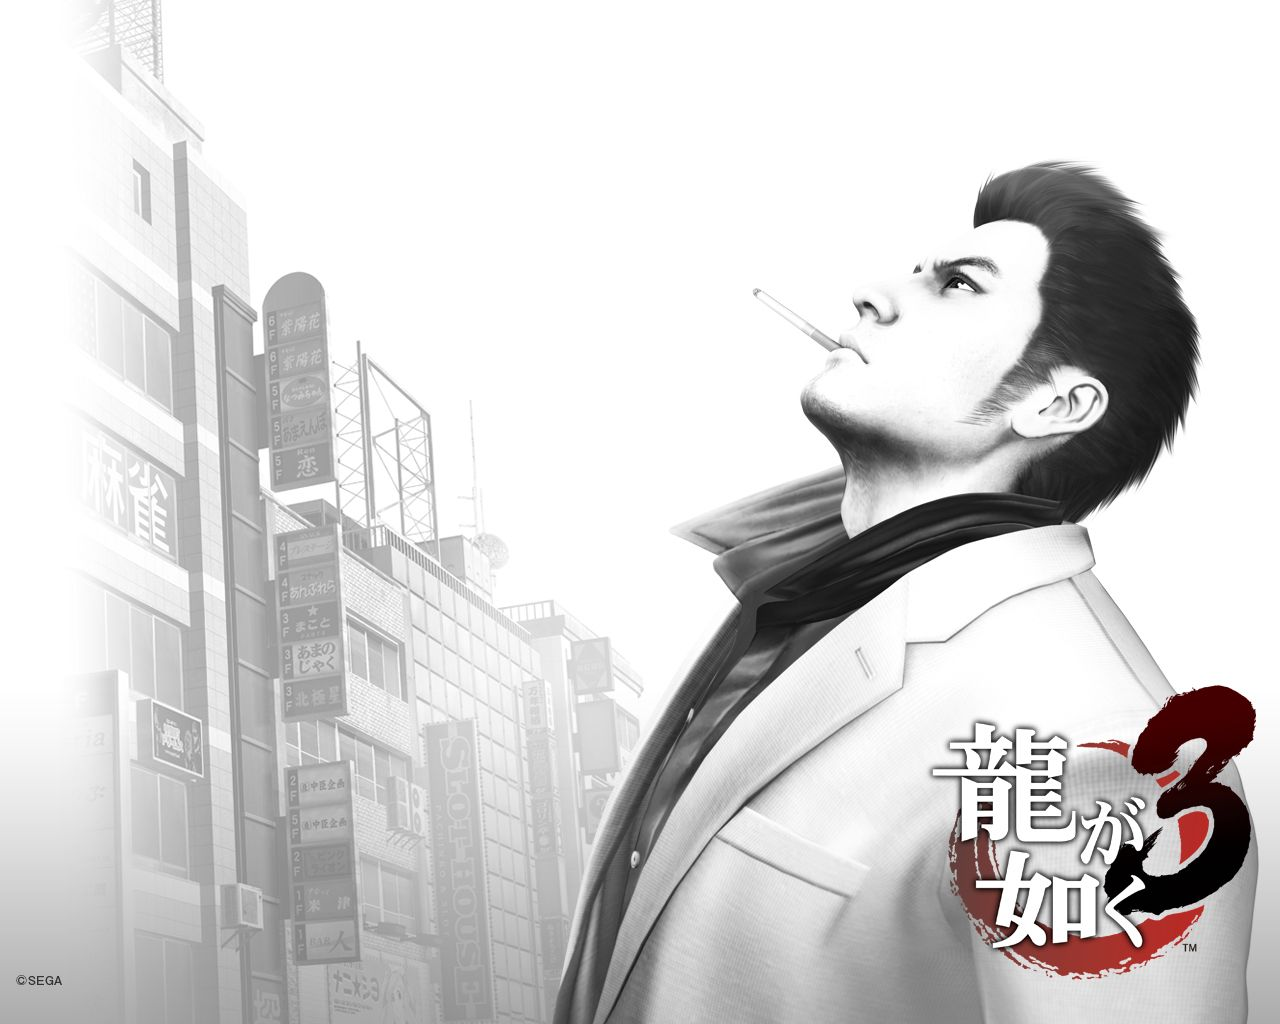 Yakuza 3 Remaster Us